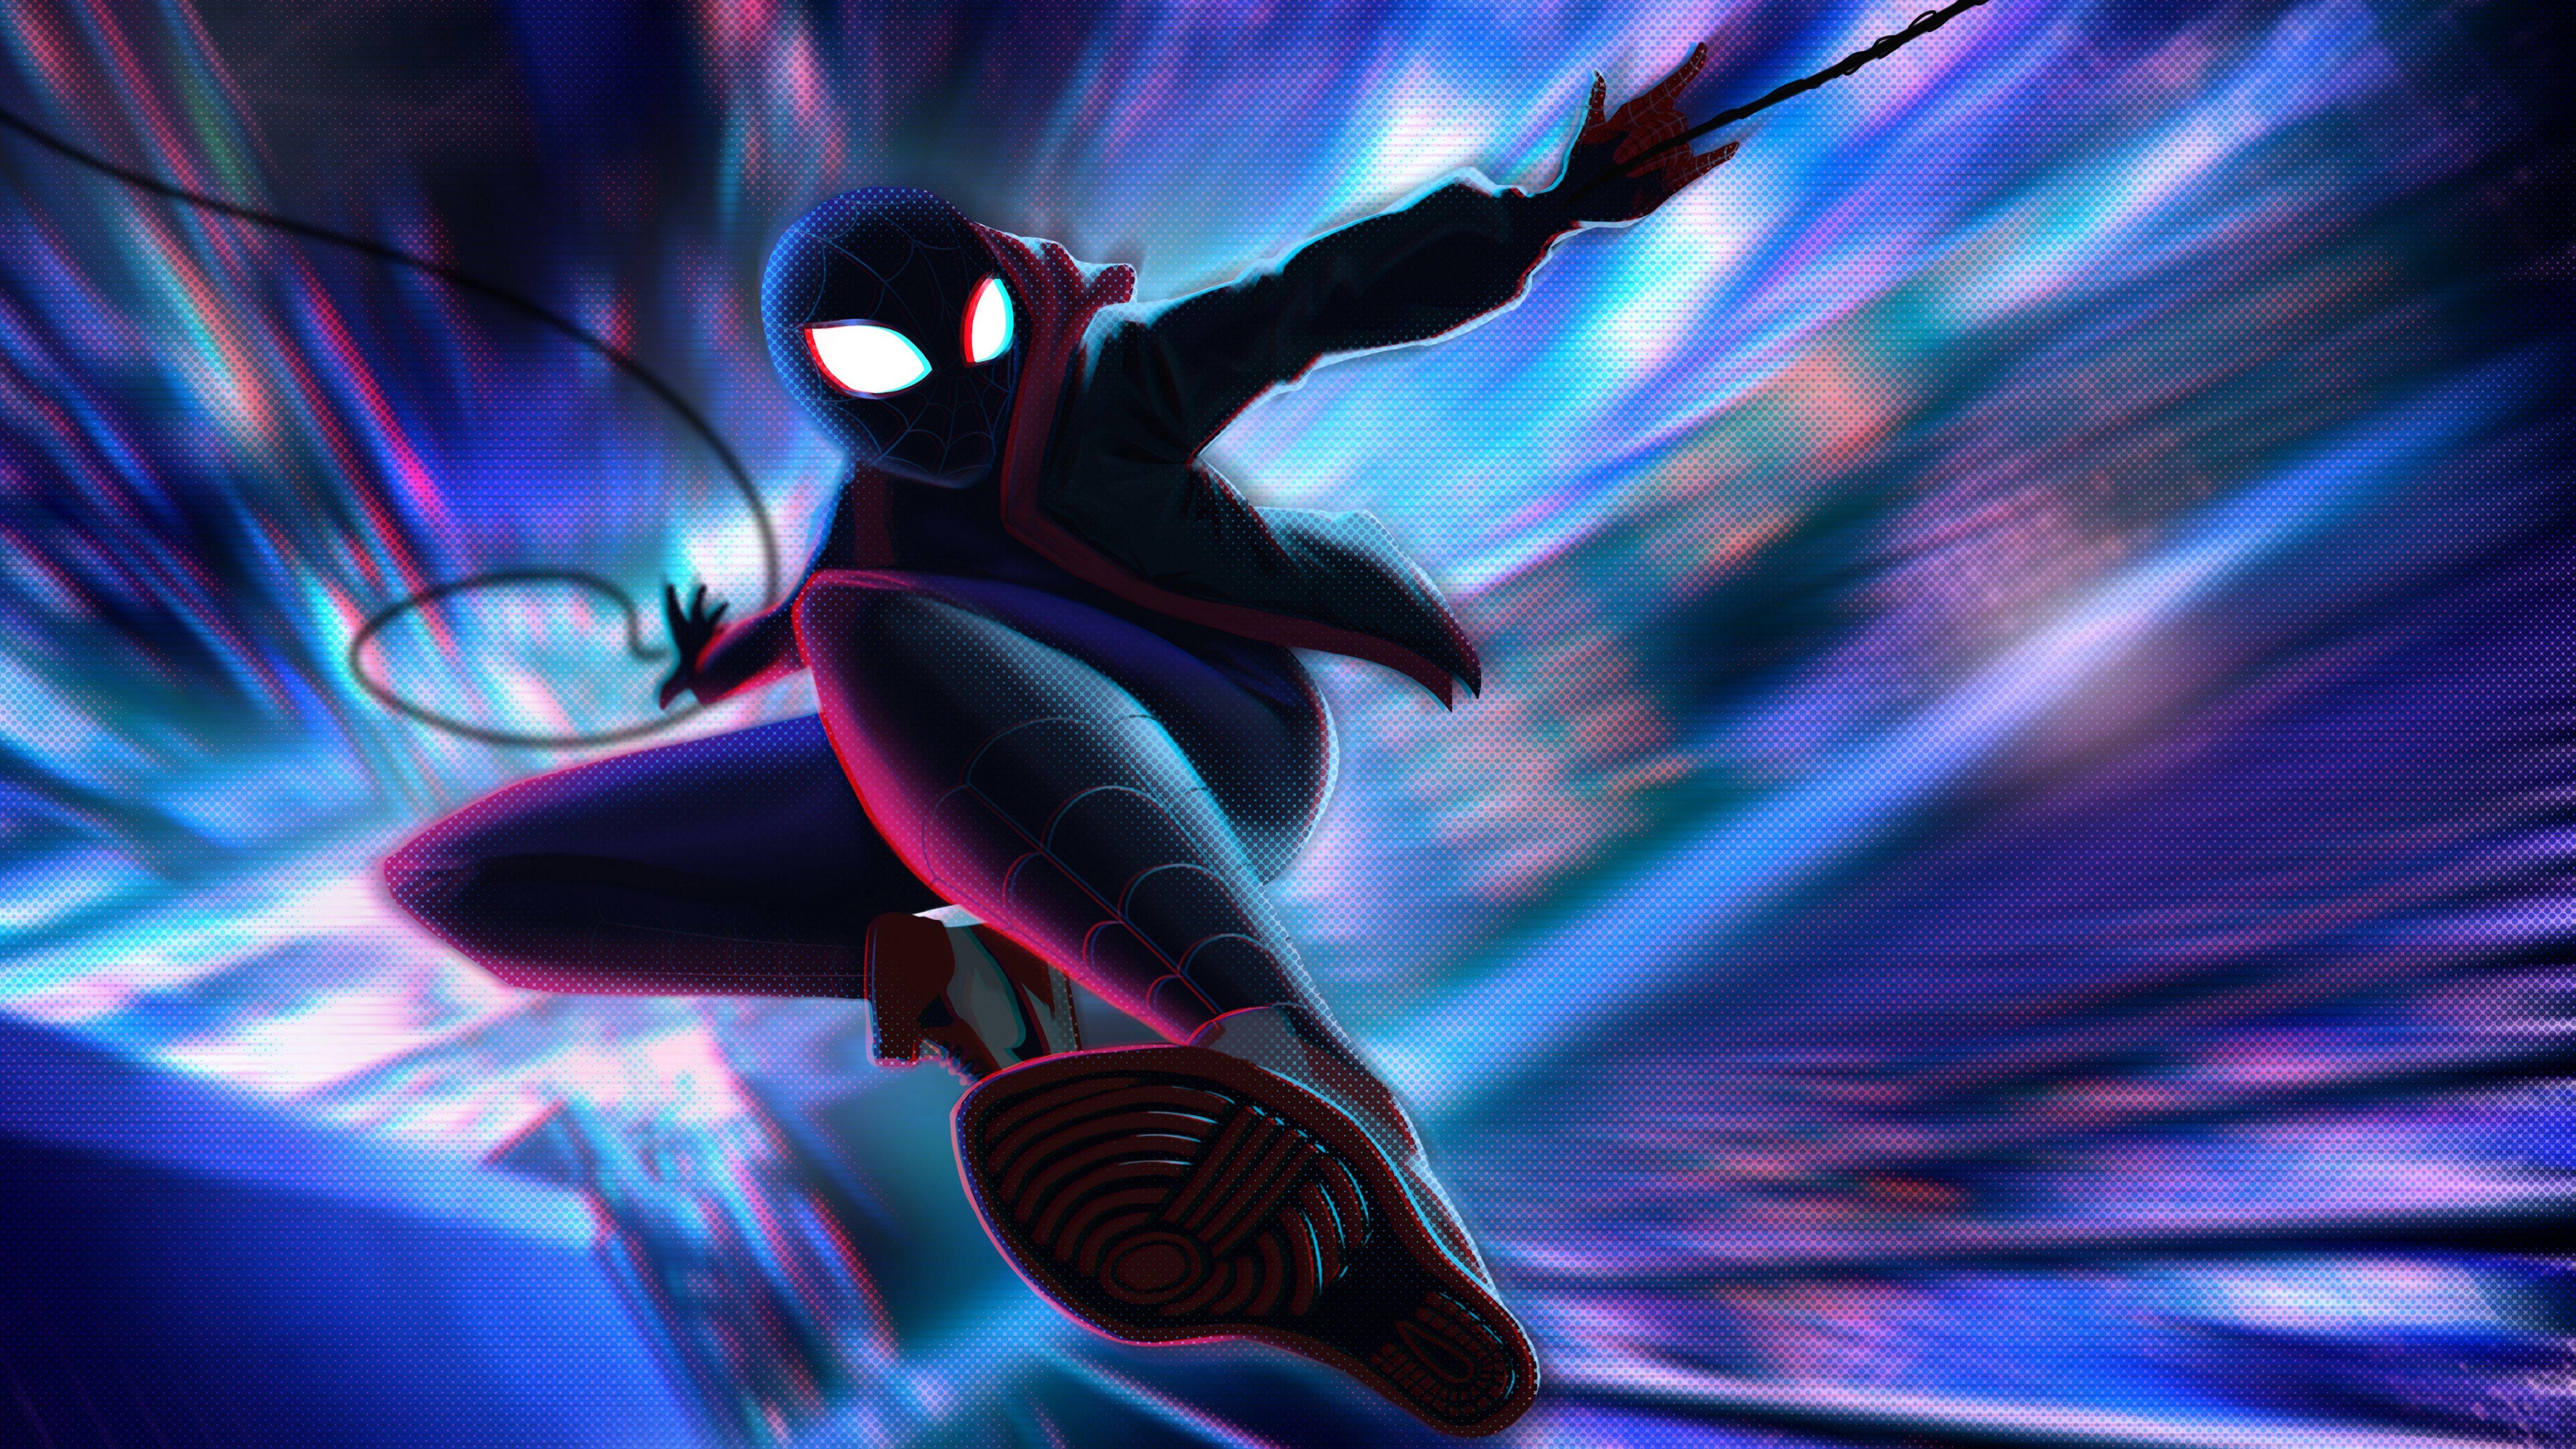 Miles Morales Spider Man Into The Spider Verse 4k 5k Spider Verse Wallpaper Spiderman Into The Spider Verse Wallpaper Into The Spider Verse Wallpaper